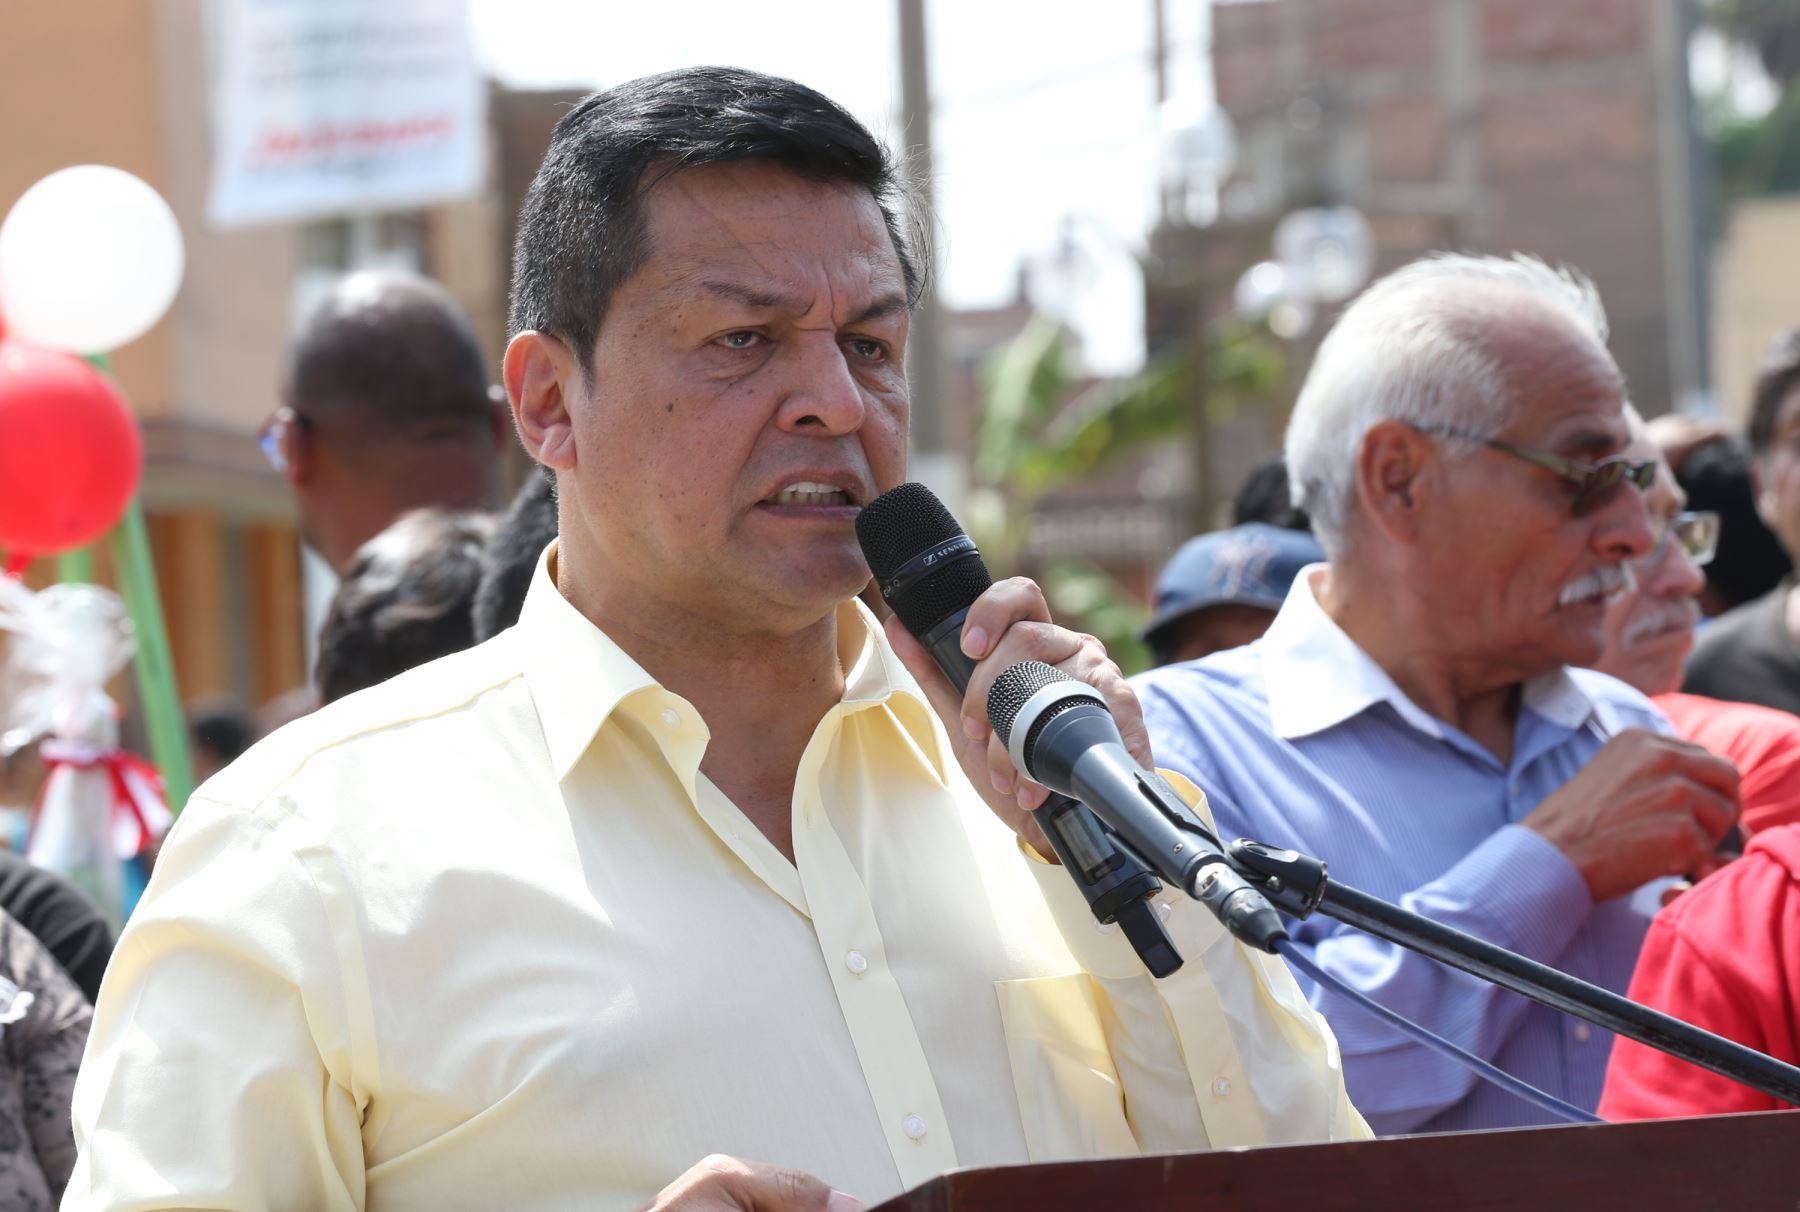 Exalcalde del Callao, Juan Sotomayor. Foto: ANDINA/Archivo.